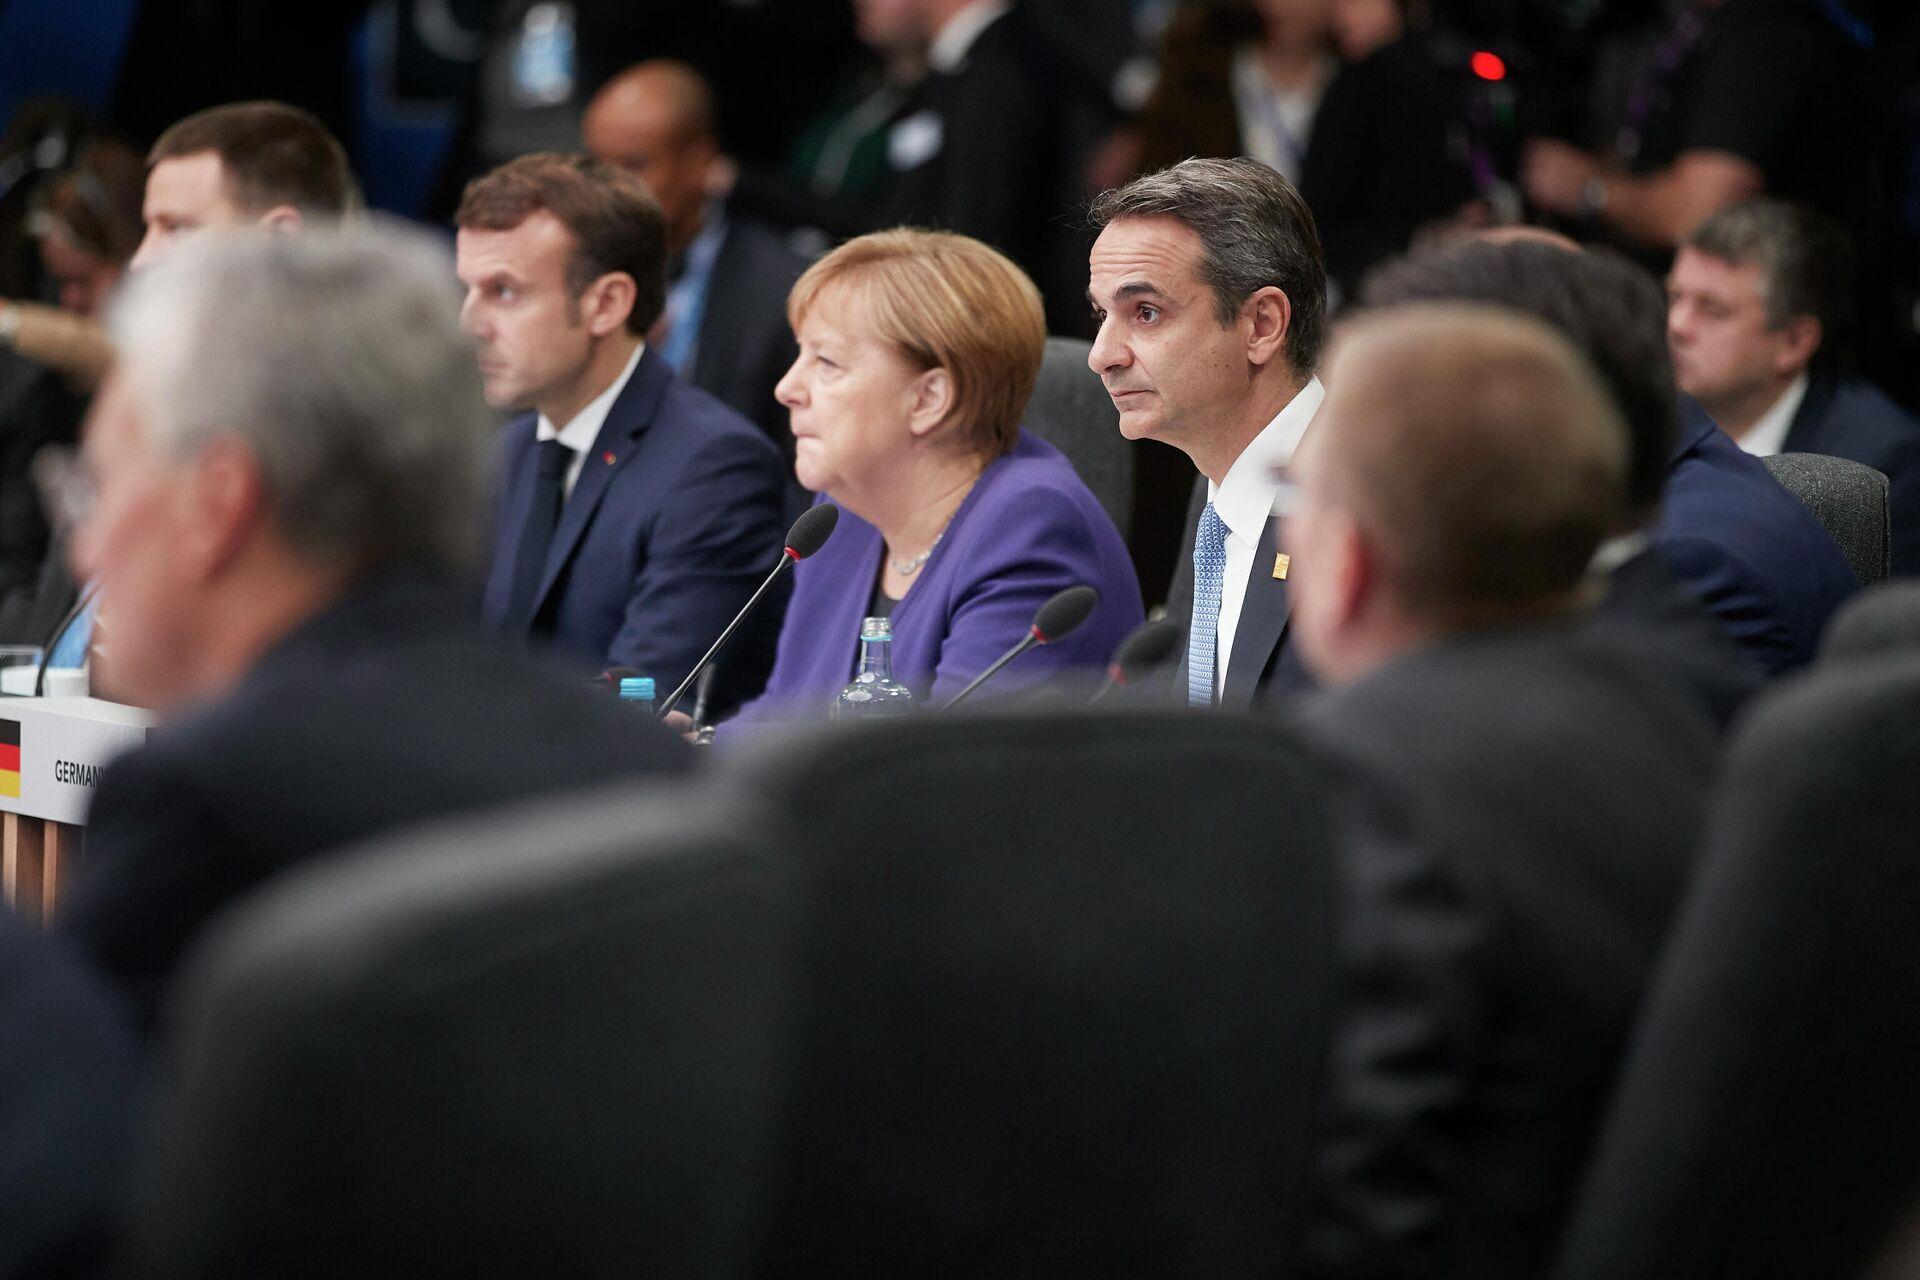 Премьер-министр Греции Кириакос Мицотакис на саммите НАТО в Лондоне. 4 декабря 2019 - РИА Новости, 1920, 31.05.2021